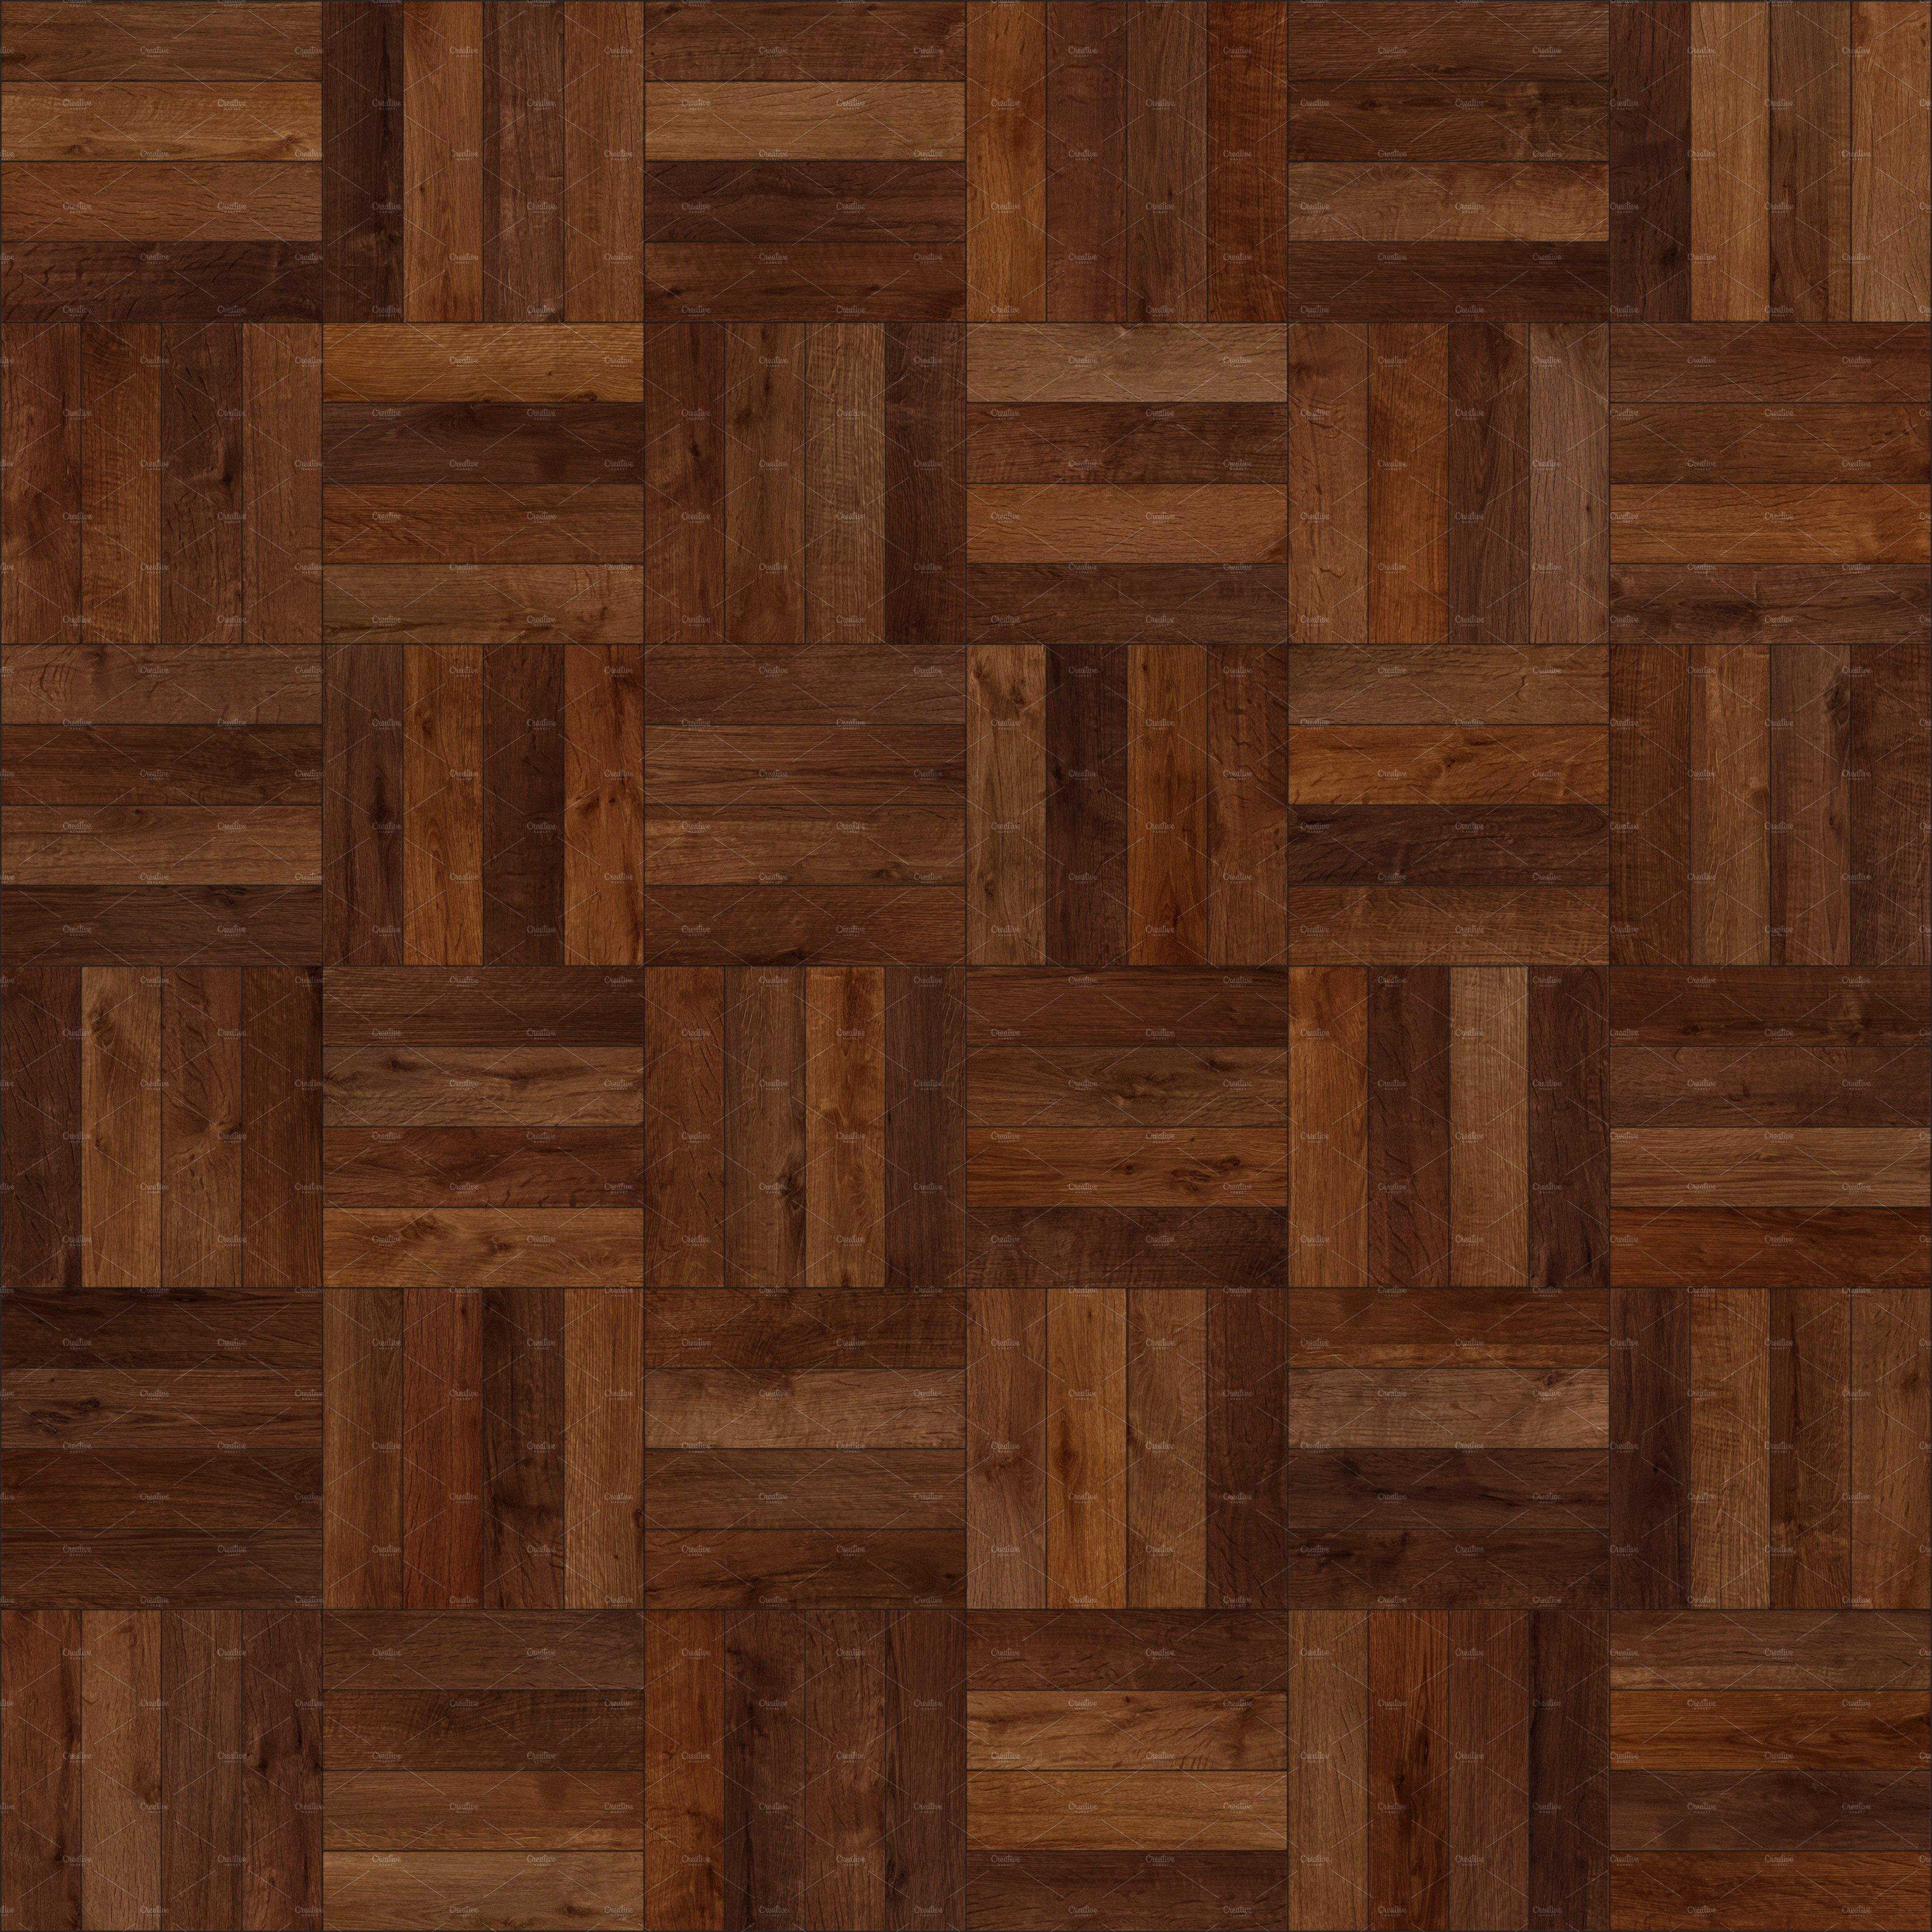 Seamless Wood Parquet Texture Textures Creative Market